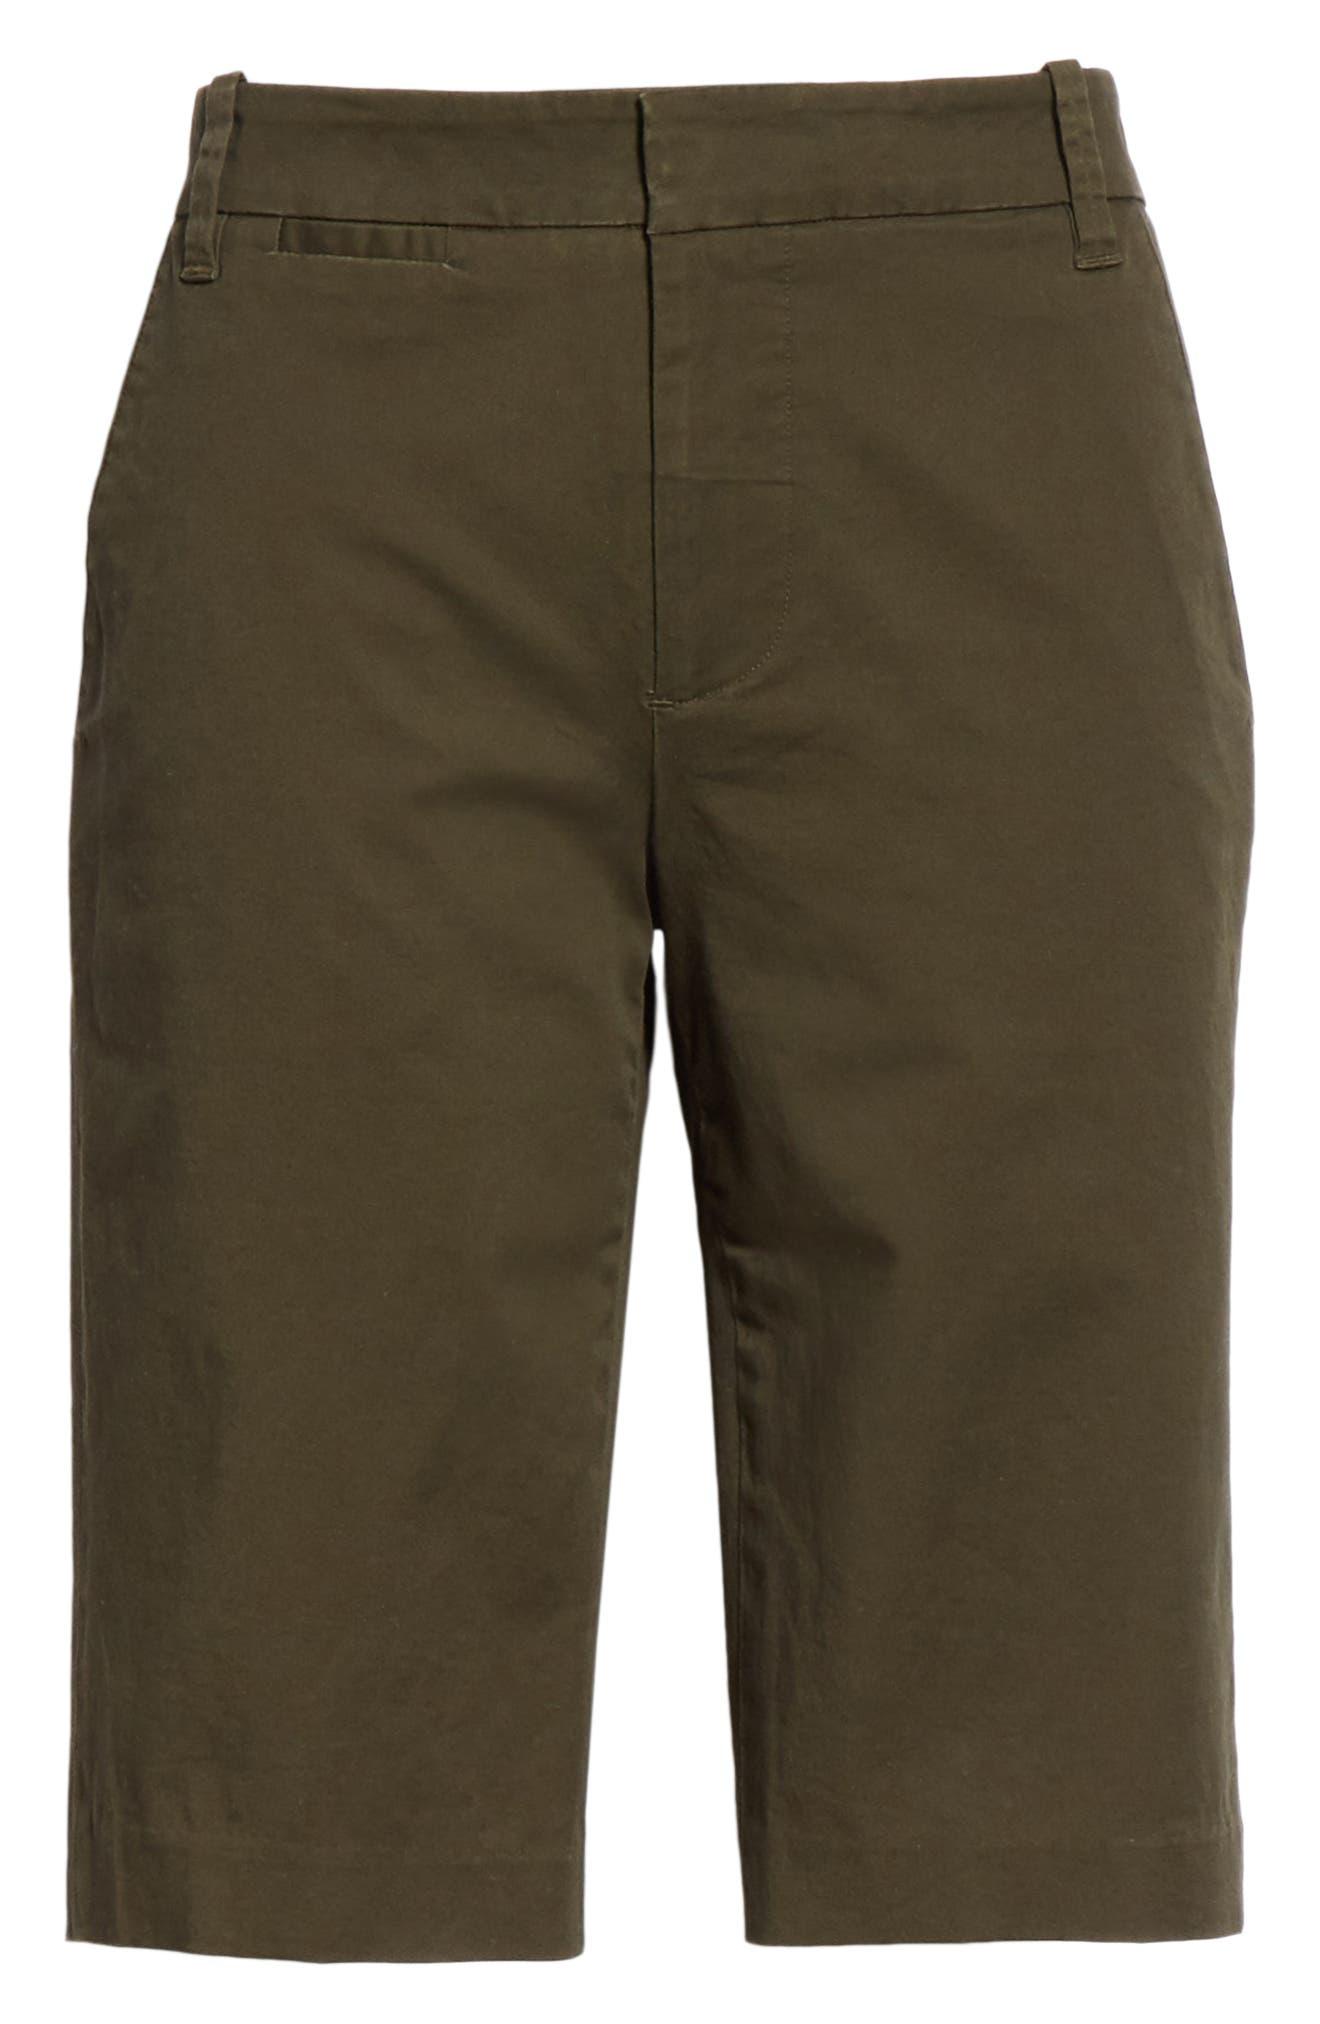 VINCE,                             Bermuda Shorts,                             Alternate thumbnail 6, color,                             ALPINE